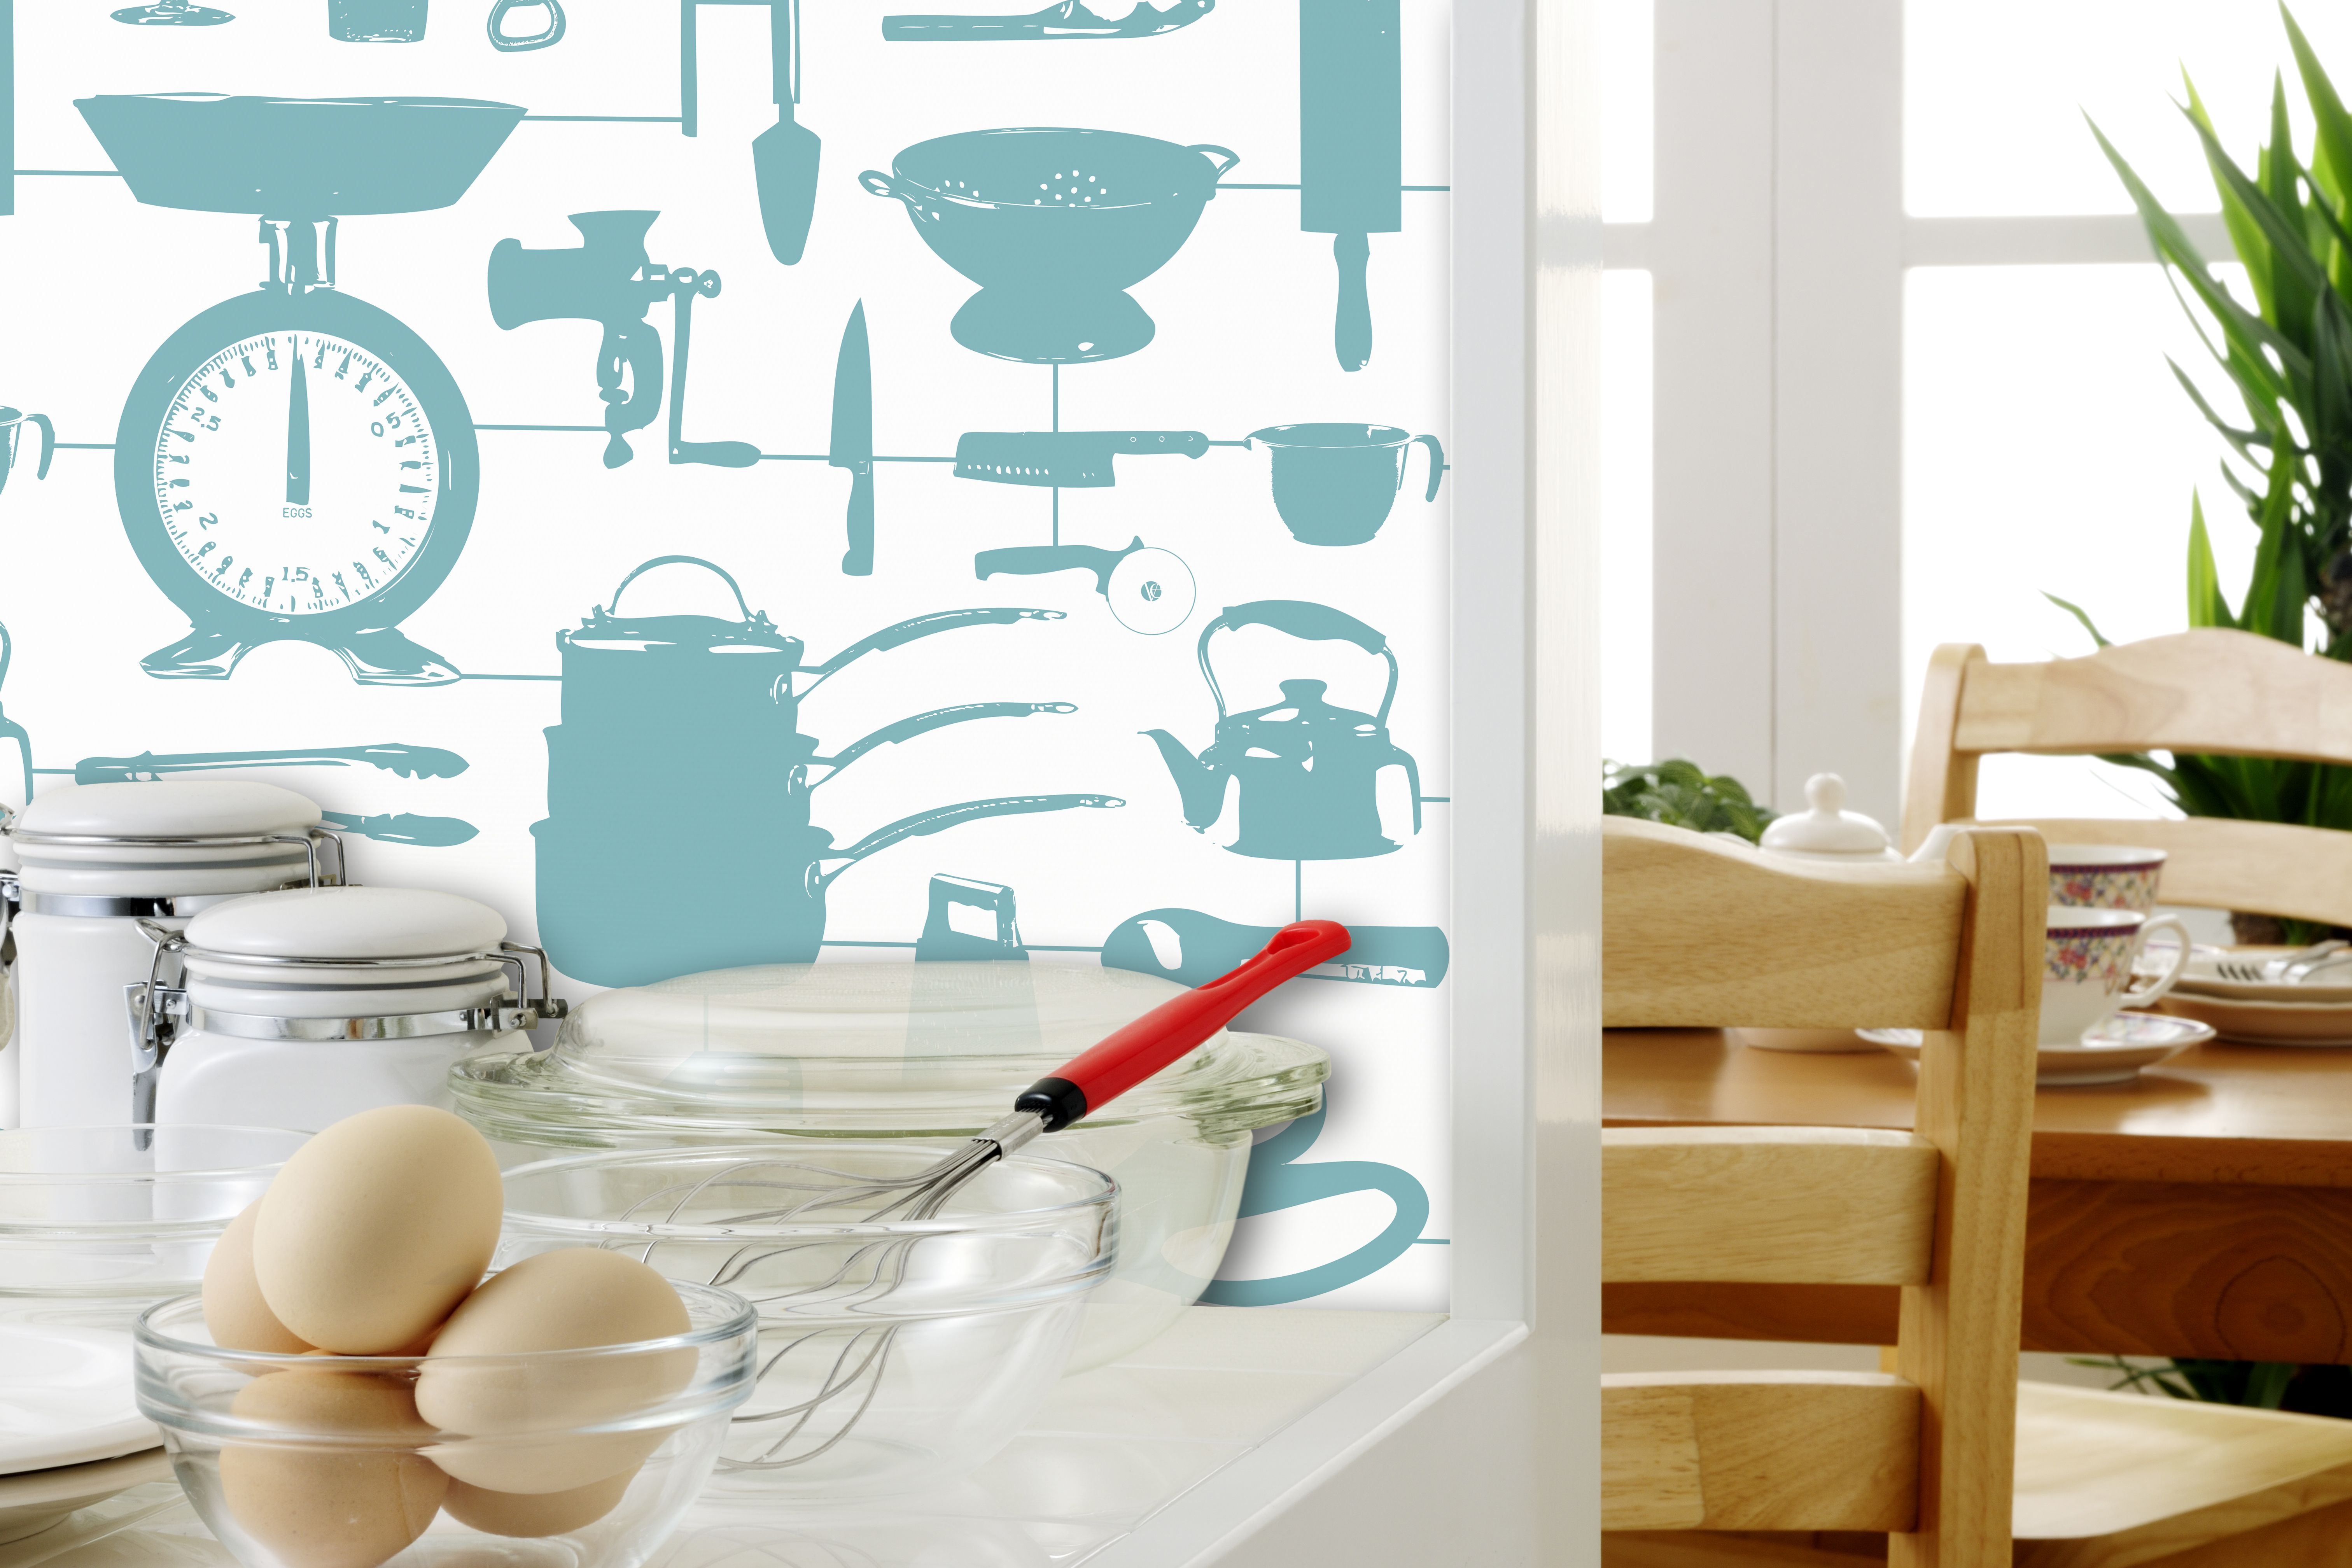 Airfix Kitchen\' wallpaper designed by Victoria Eggs for Graduate ...